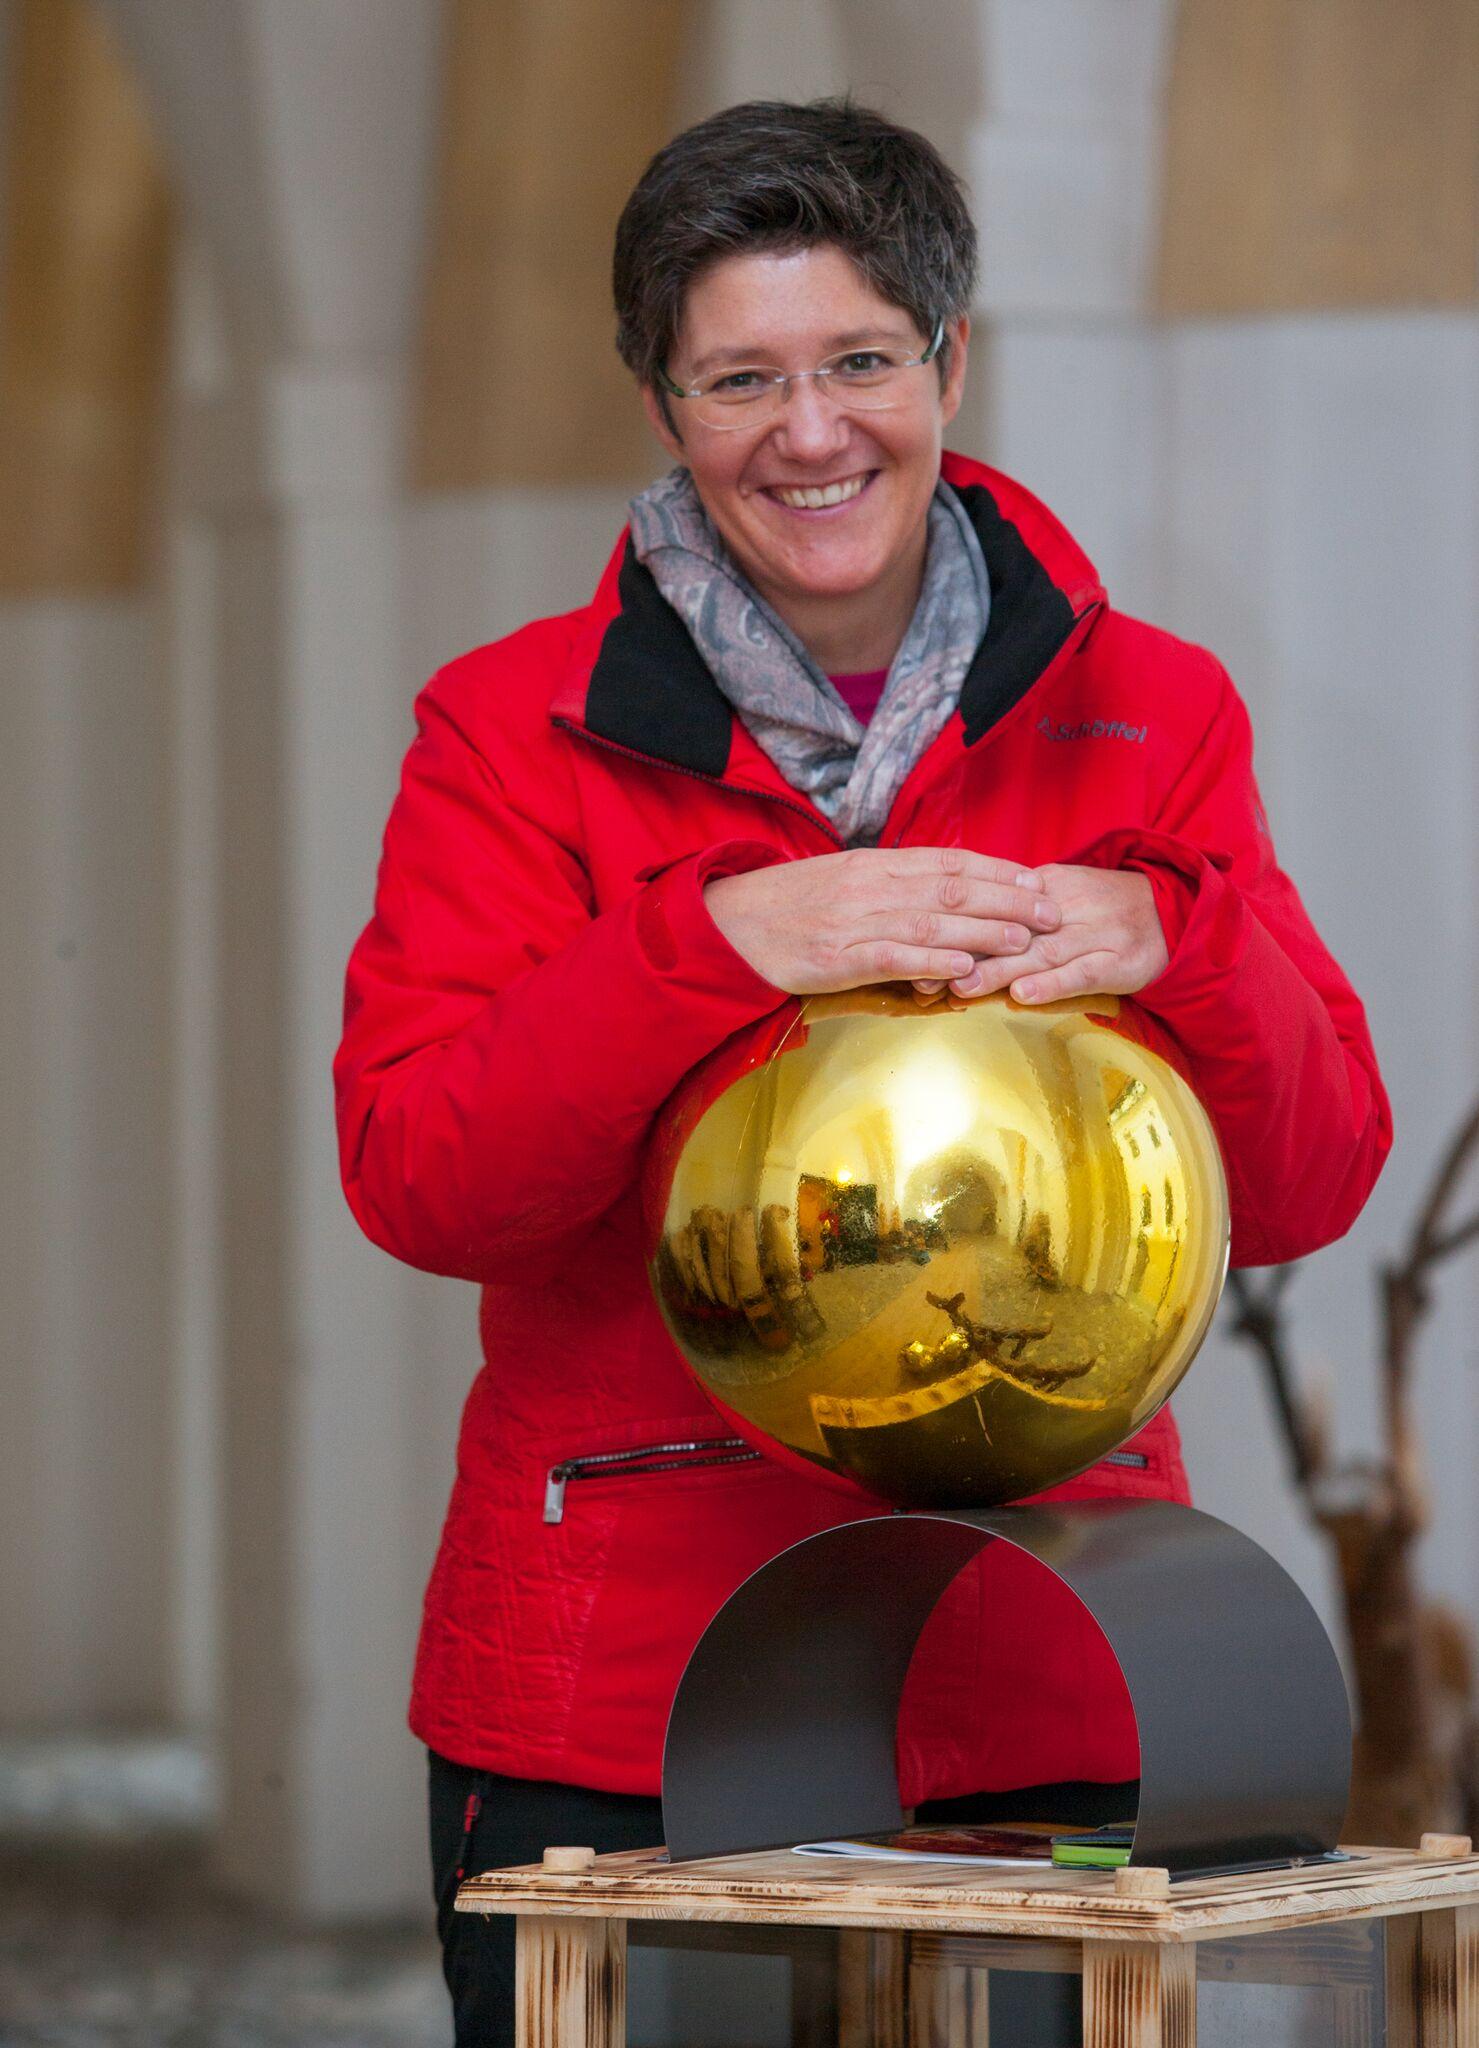 judith-eidenhammer-advent-mondsee-(c)Wolfgang-Weinhäupl